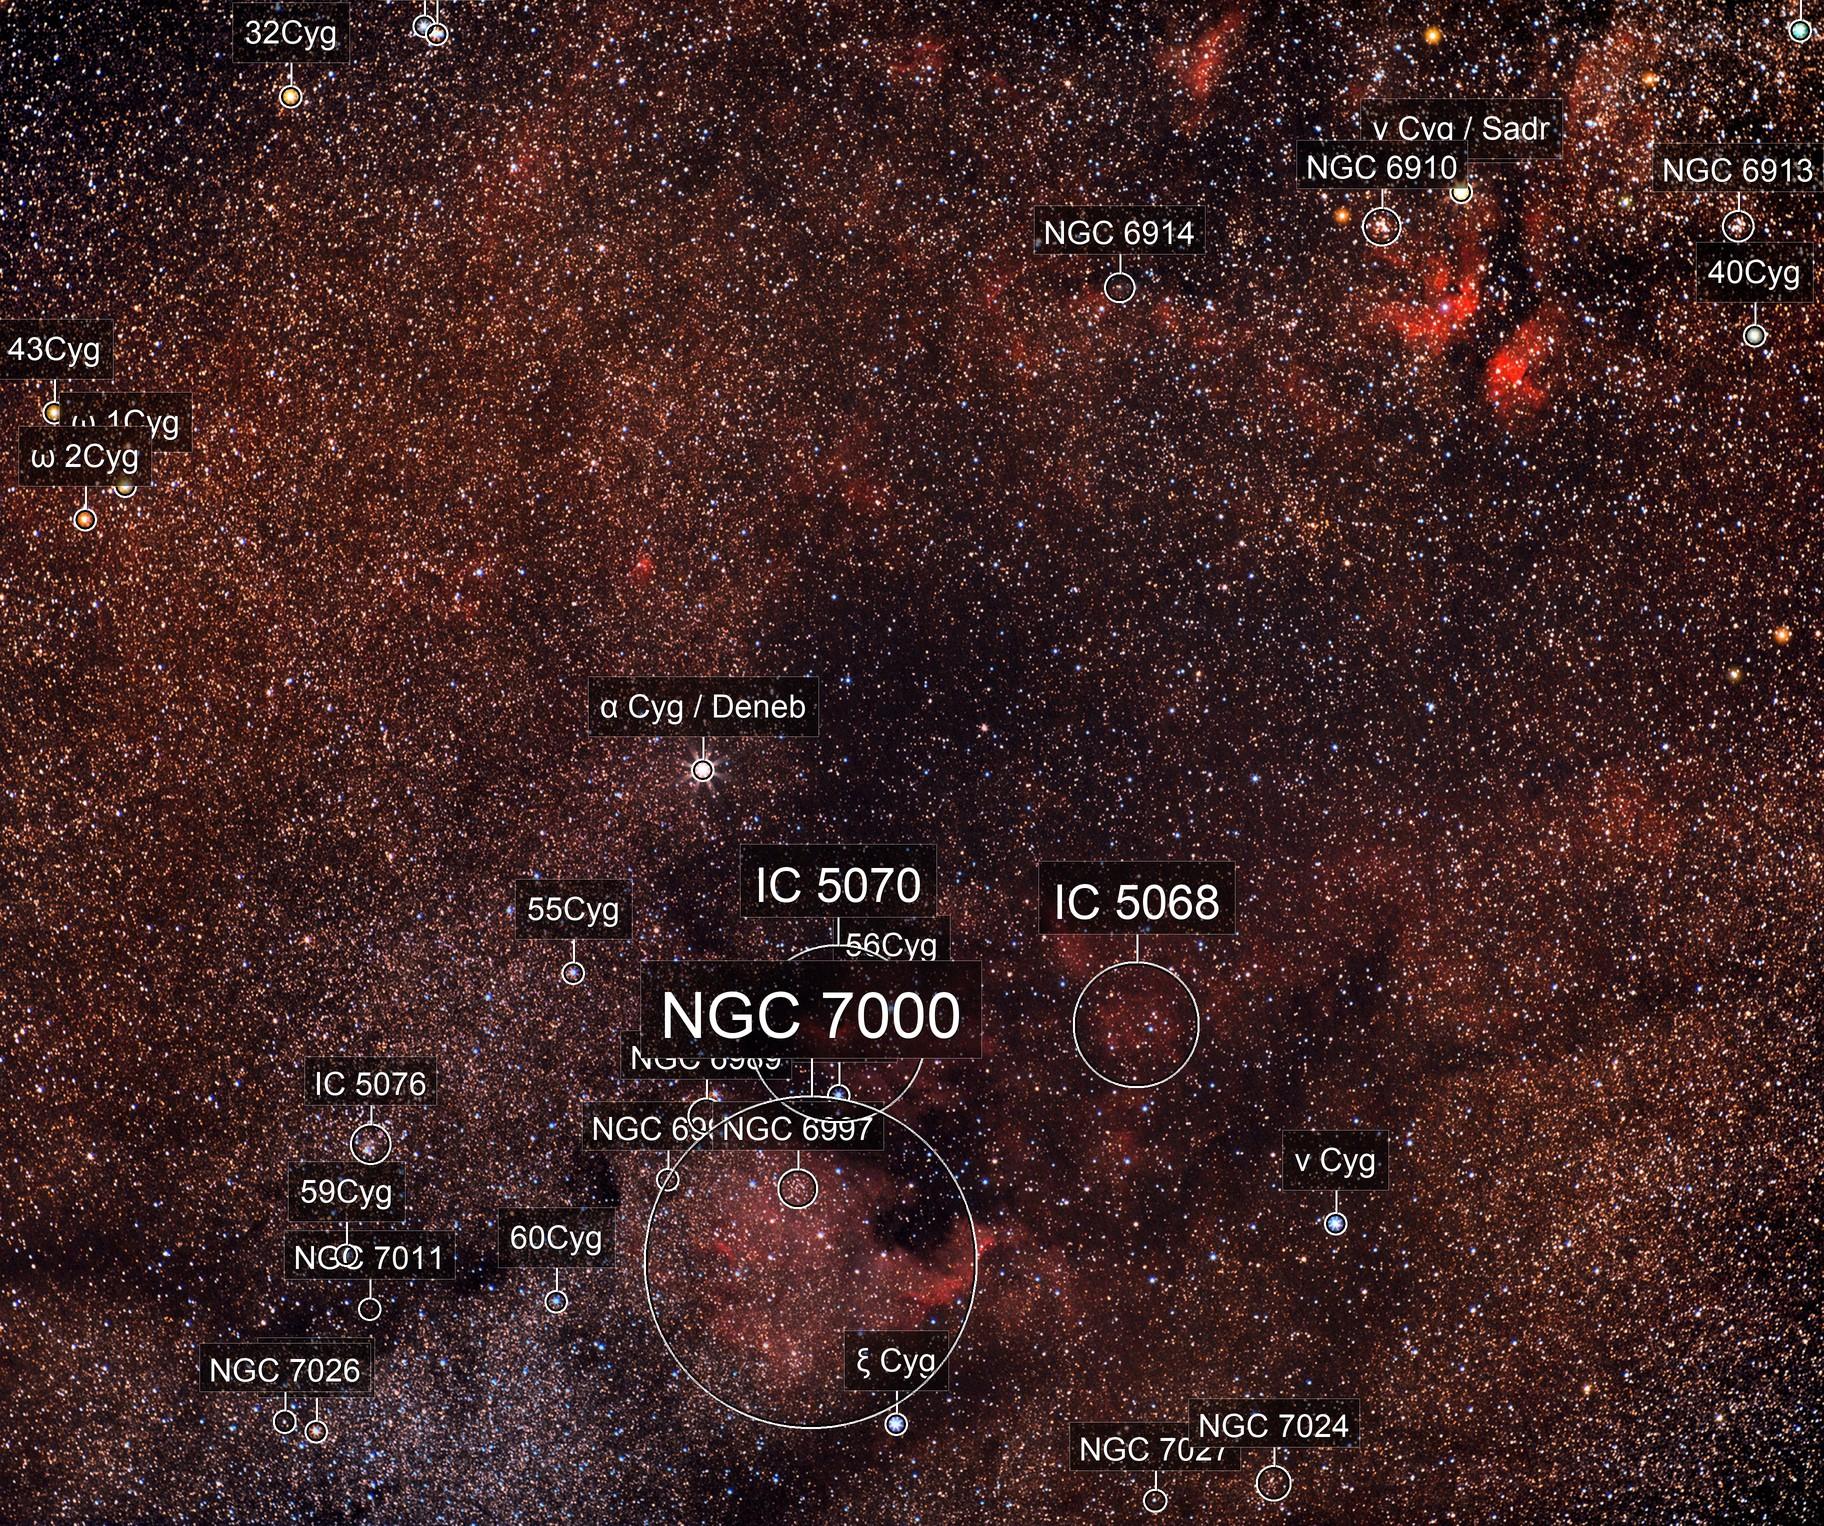 Cygnus Nebulae NGC7000 and Co / Old data sept 2016 / Canon 100Da + Samyang 85mm APO f/1.4